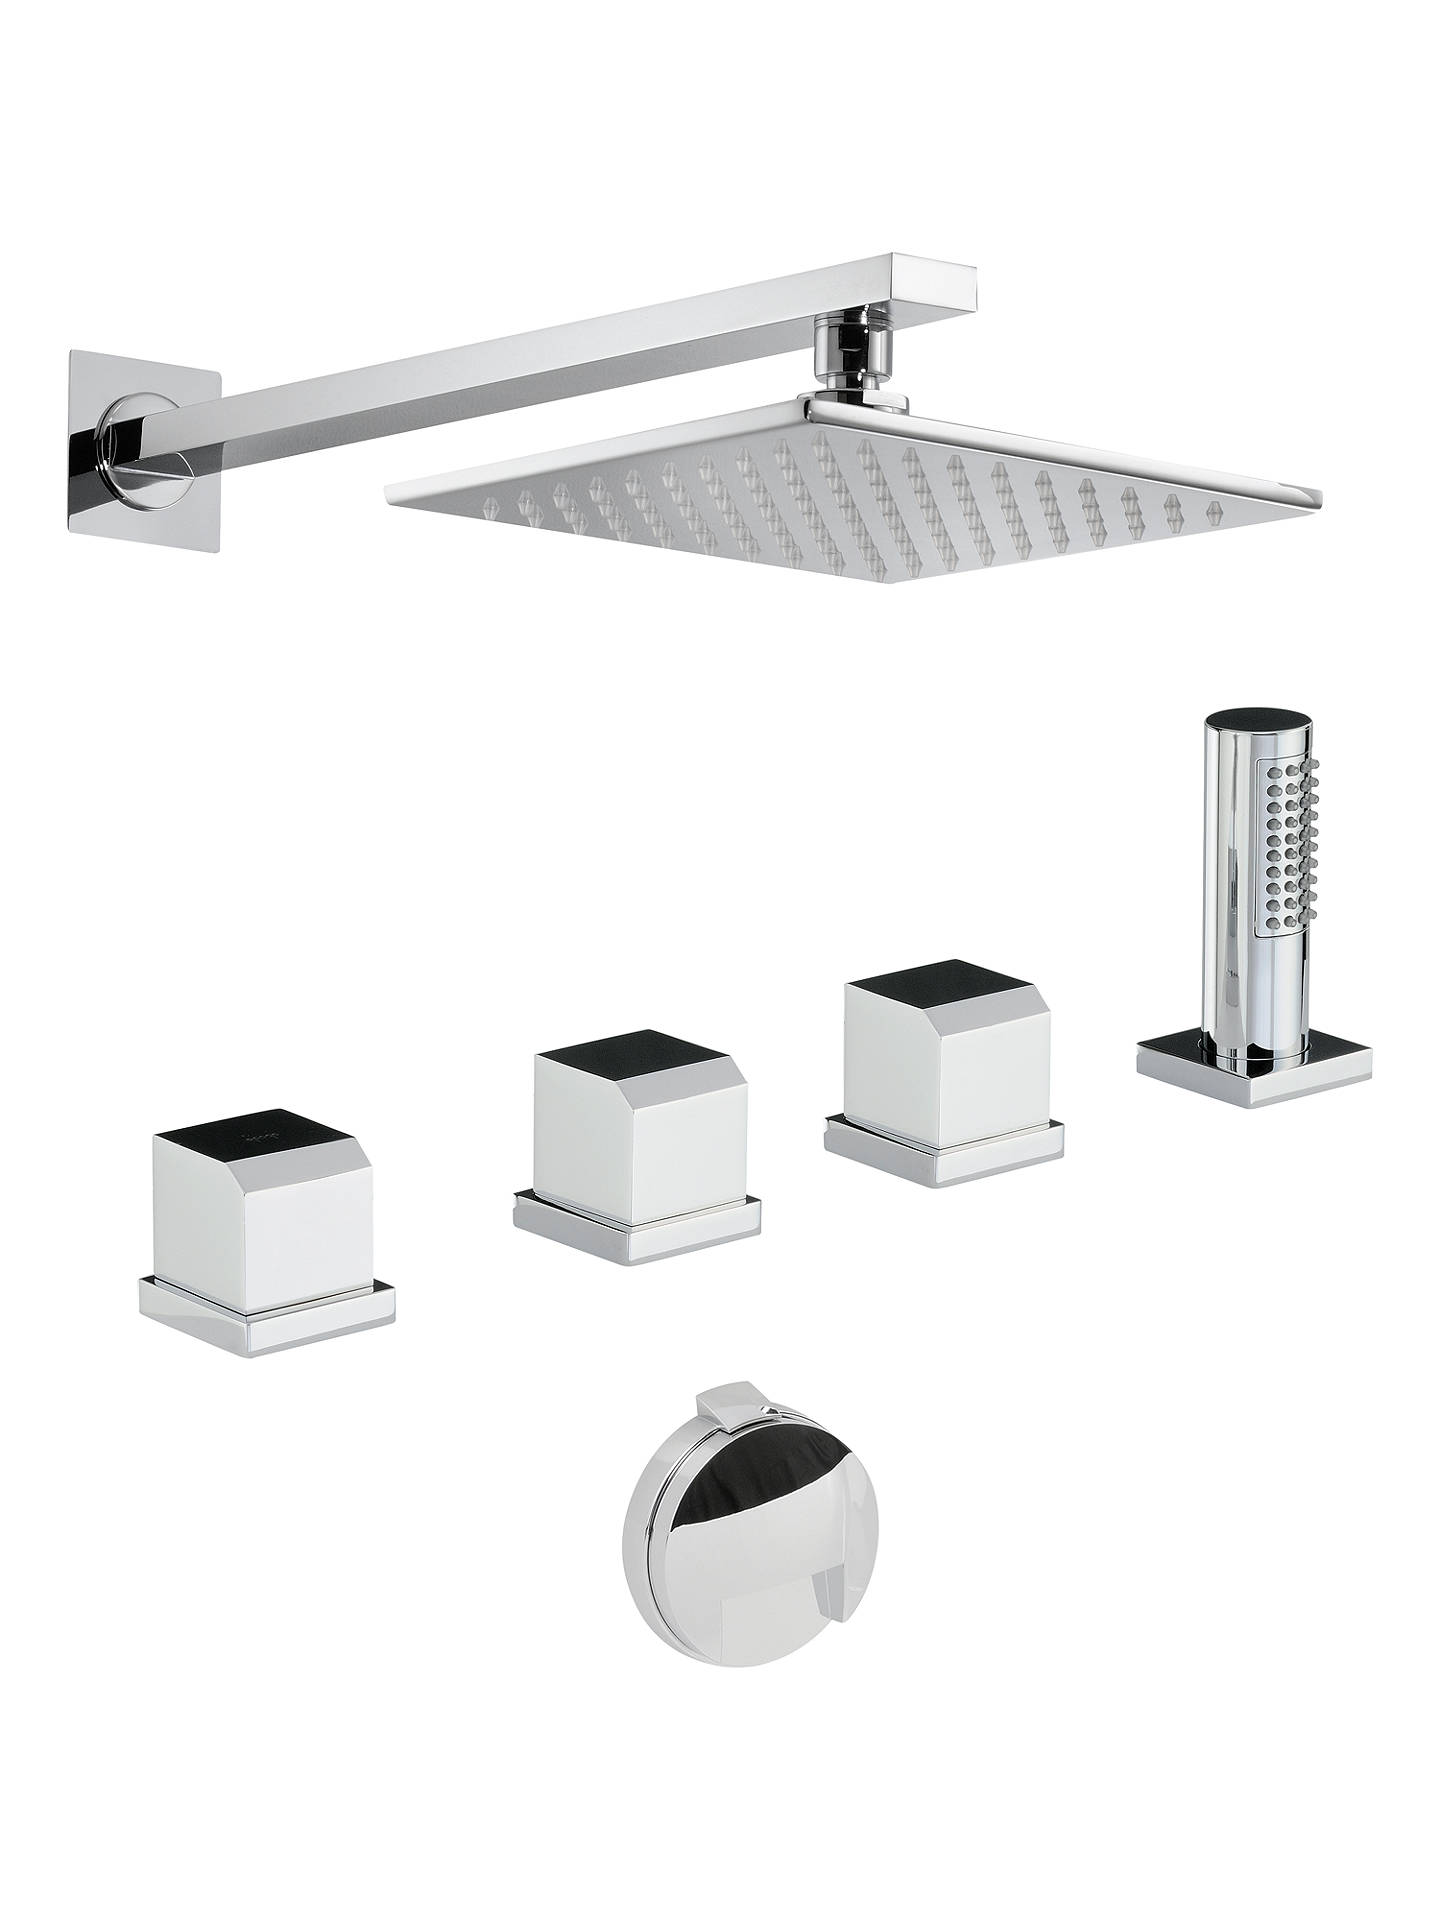 Abode Extase Thermostatic Deck Mounted Bathroom Overflow Filler Tap